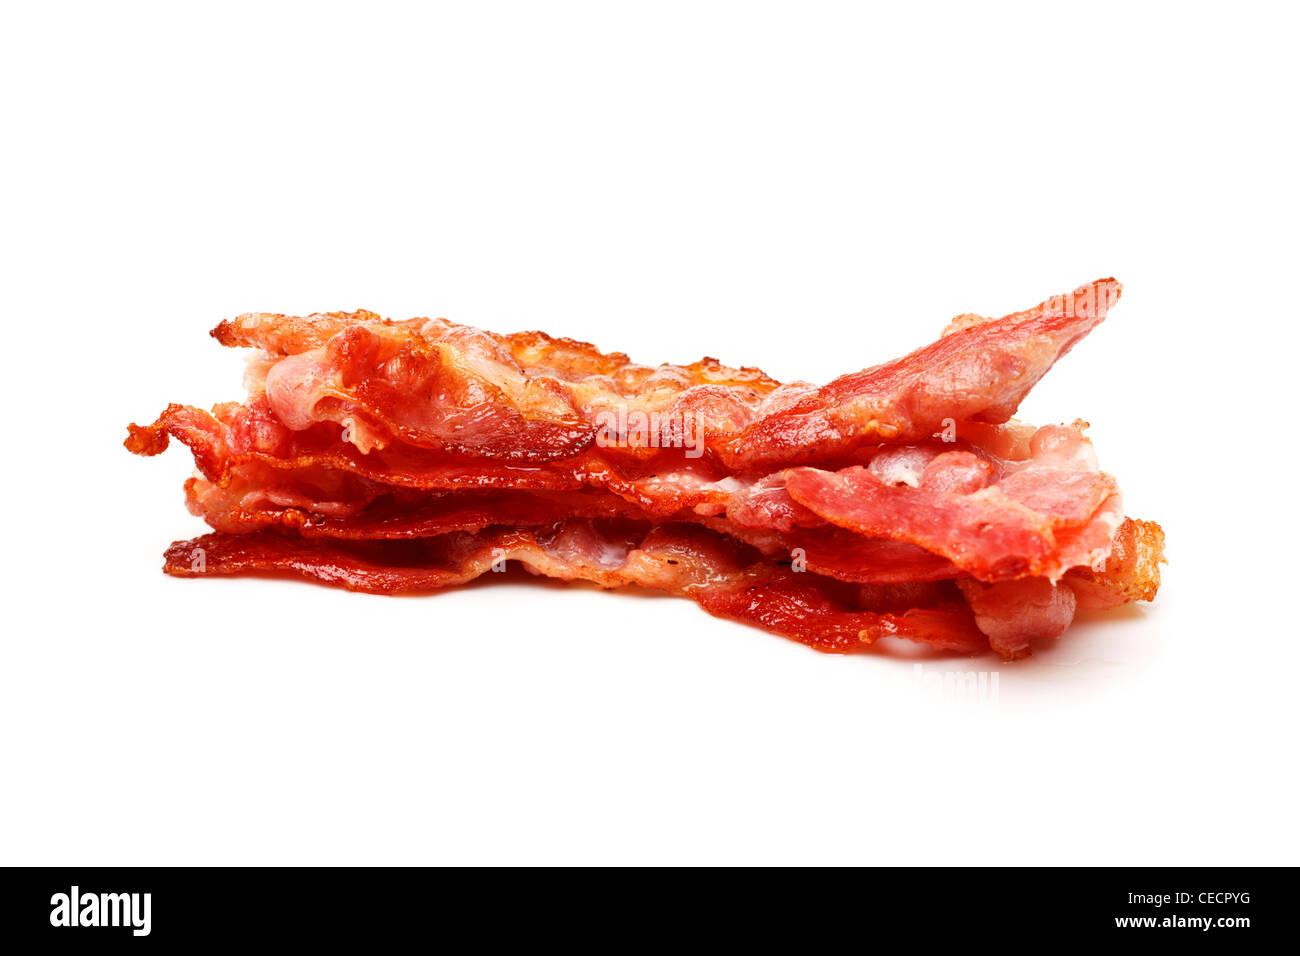 Pile de tranches de bacon sur fond blanc Photo Stock